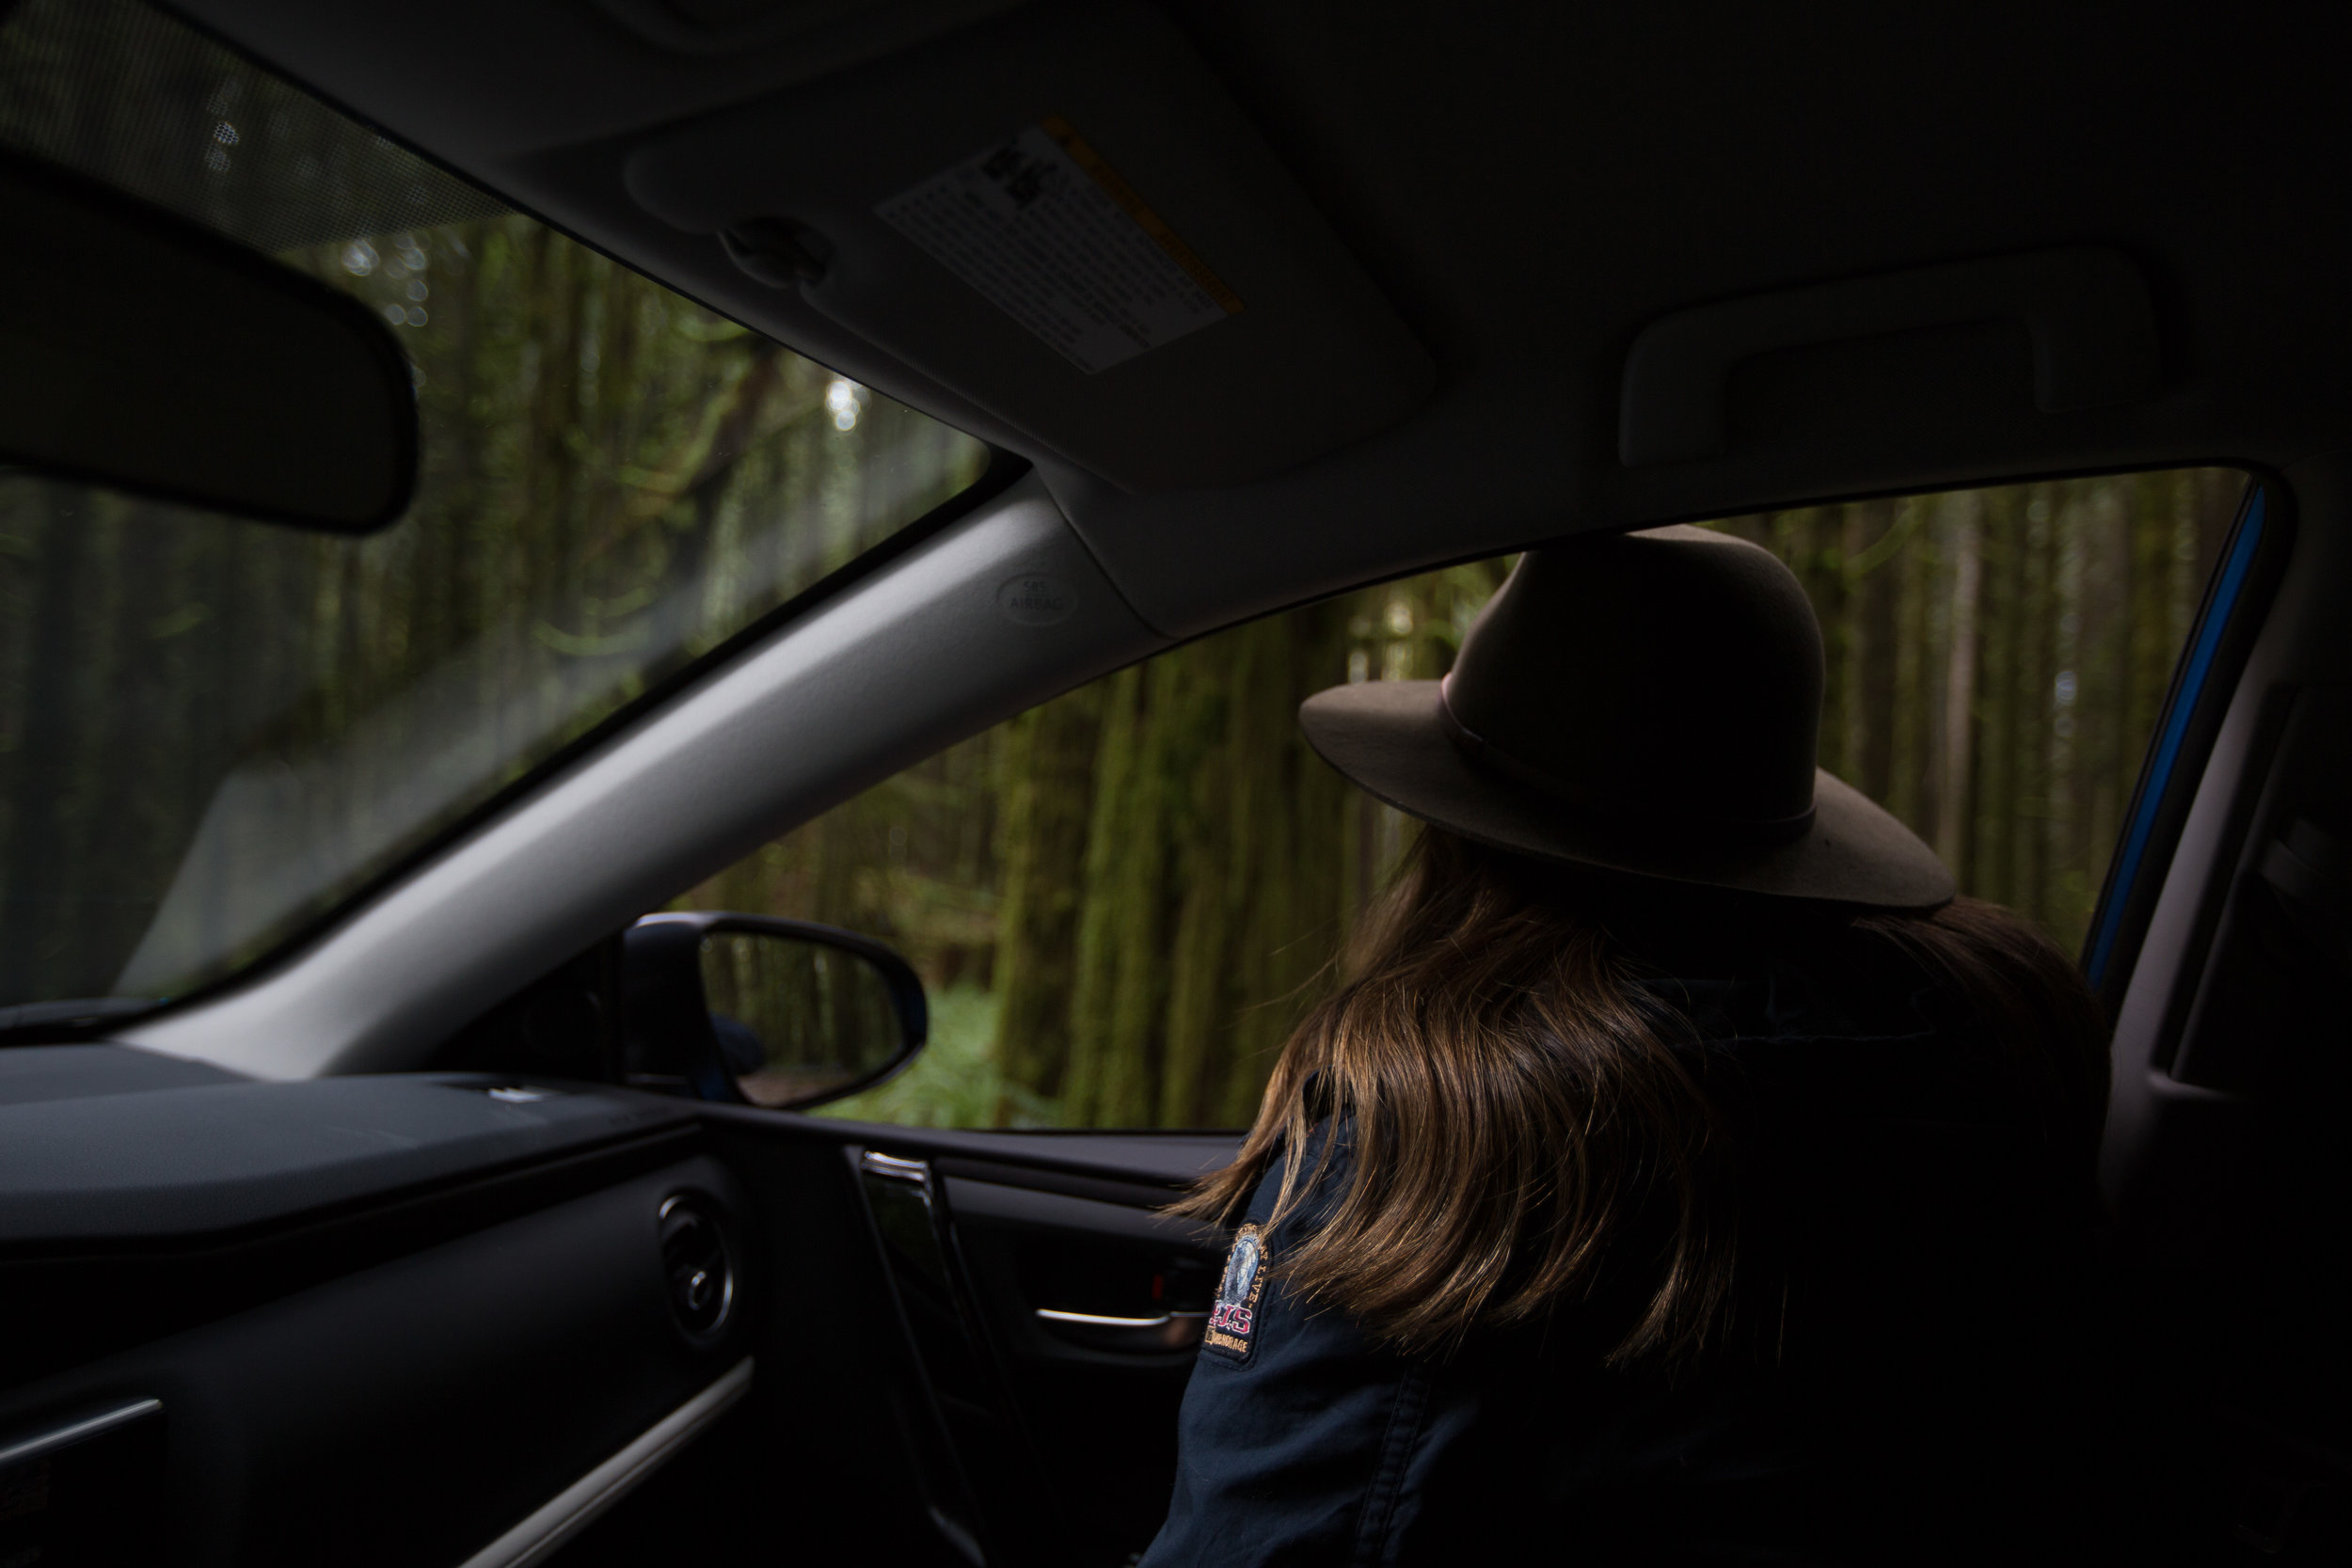 Toyota - Golden Ears Provincial Park